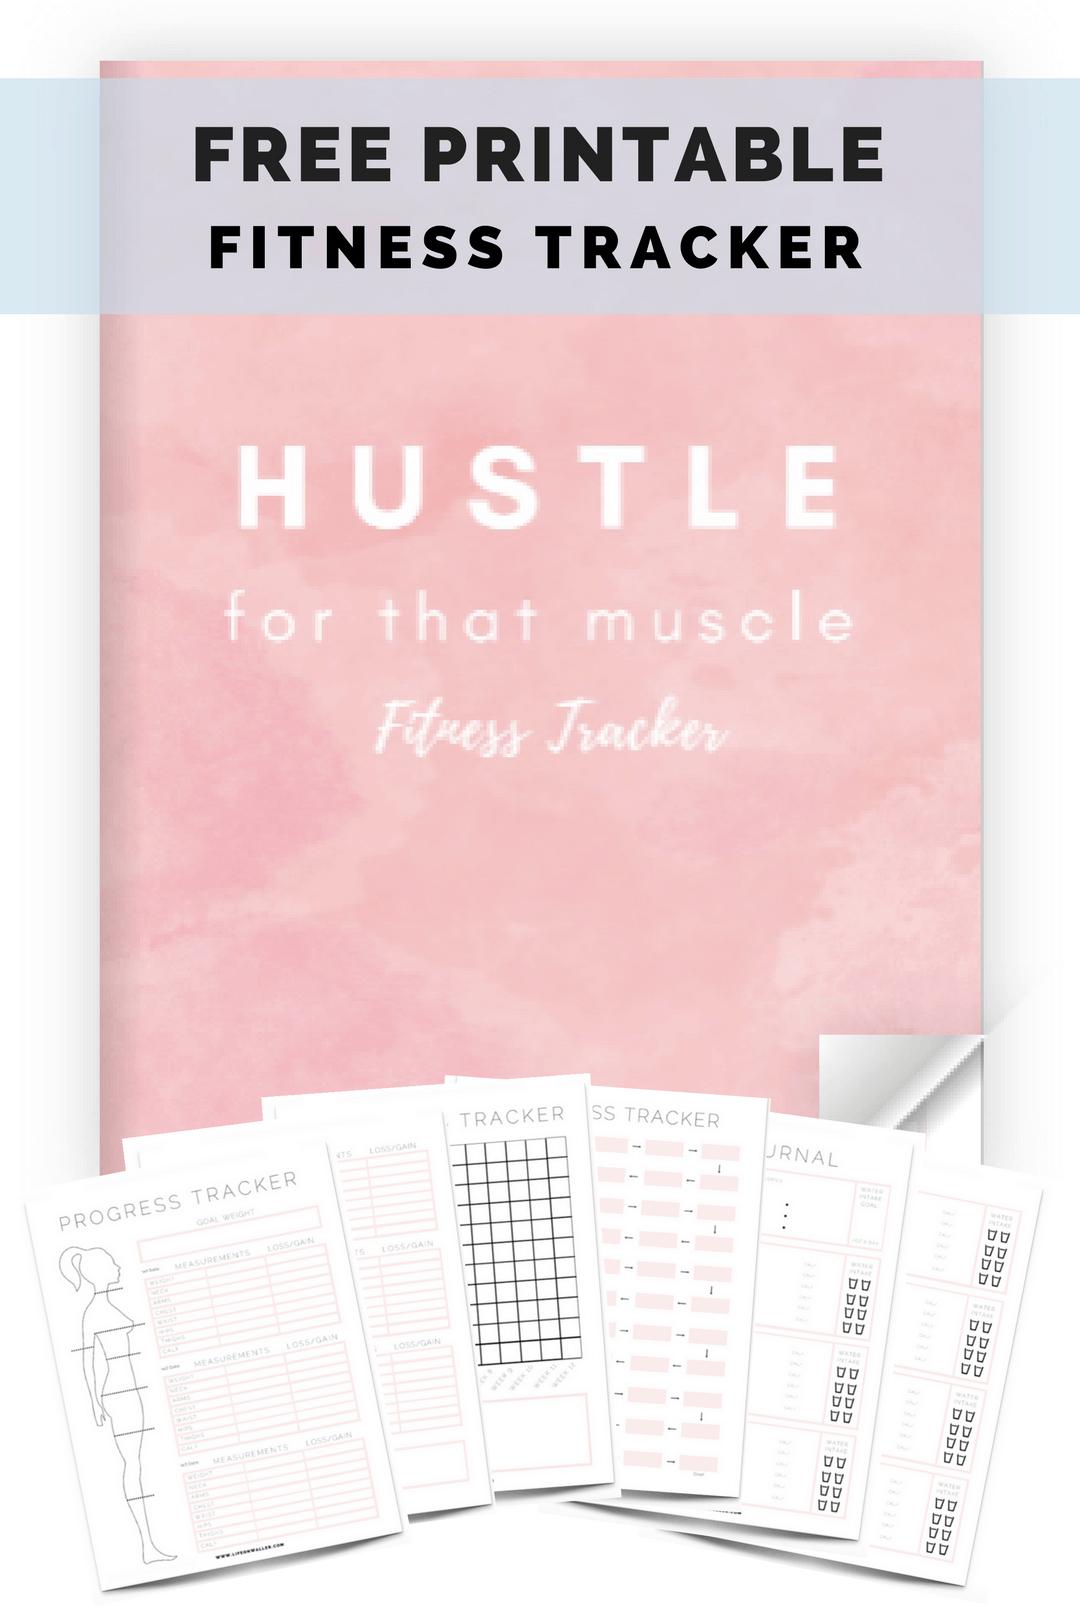 Free Printable Fitness Tracker - Cassie Scroggins,  #Cassie #fitness #Fitnessplanner #Free #Printabl...